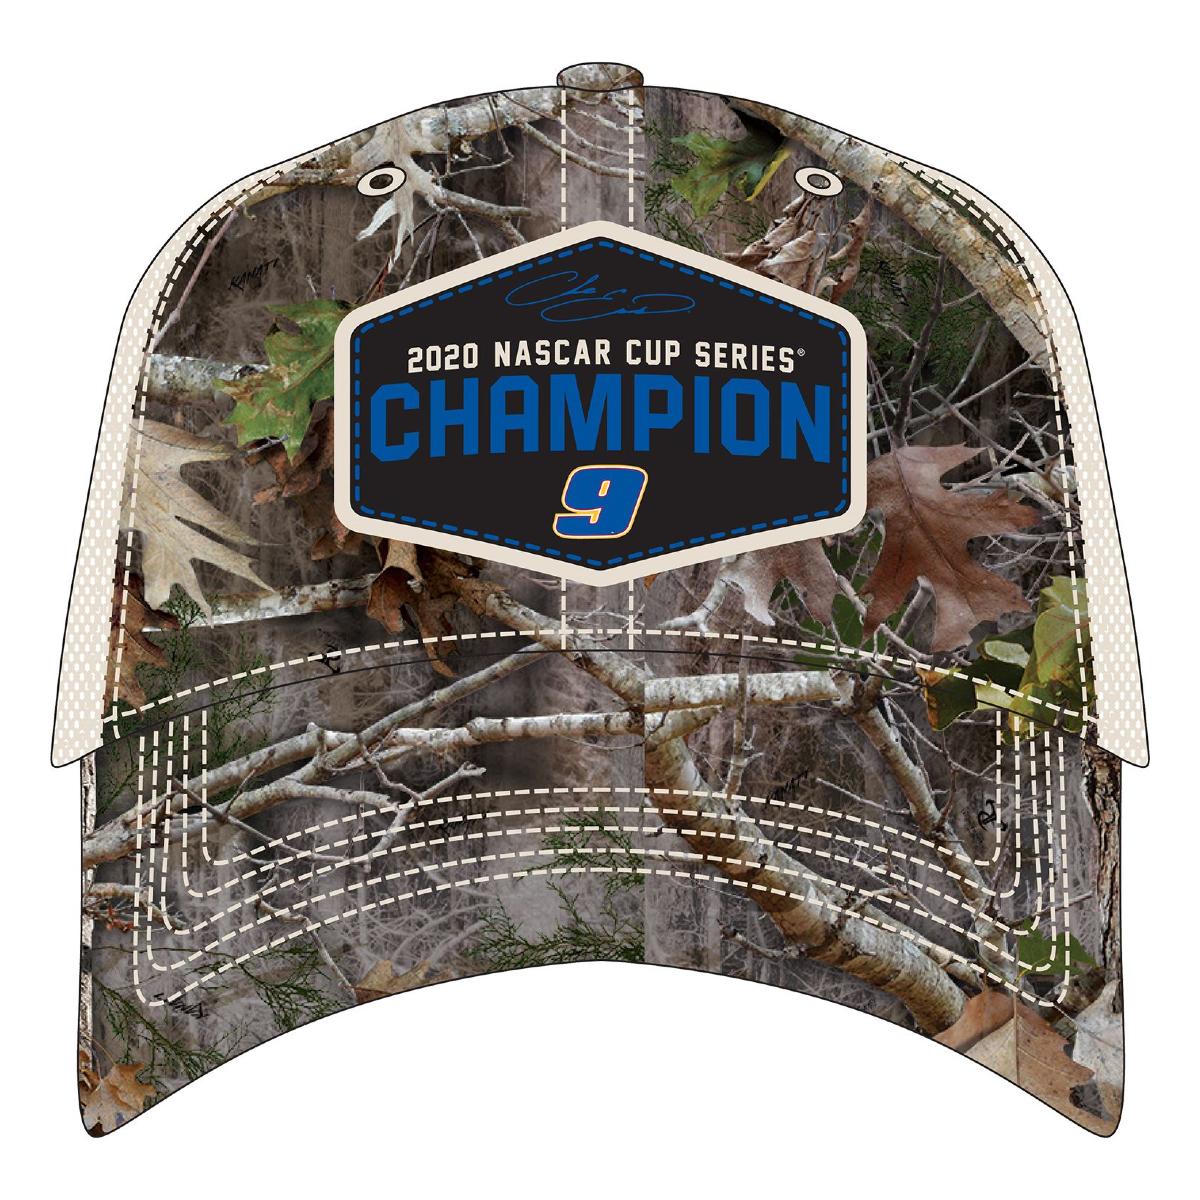 2020 NASCAR Champ Chase Elliott  - Adult TrueTimber Camo Champ Hat